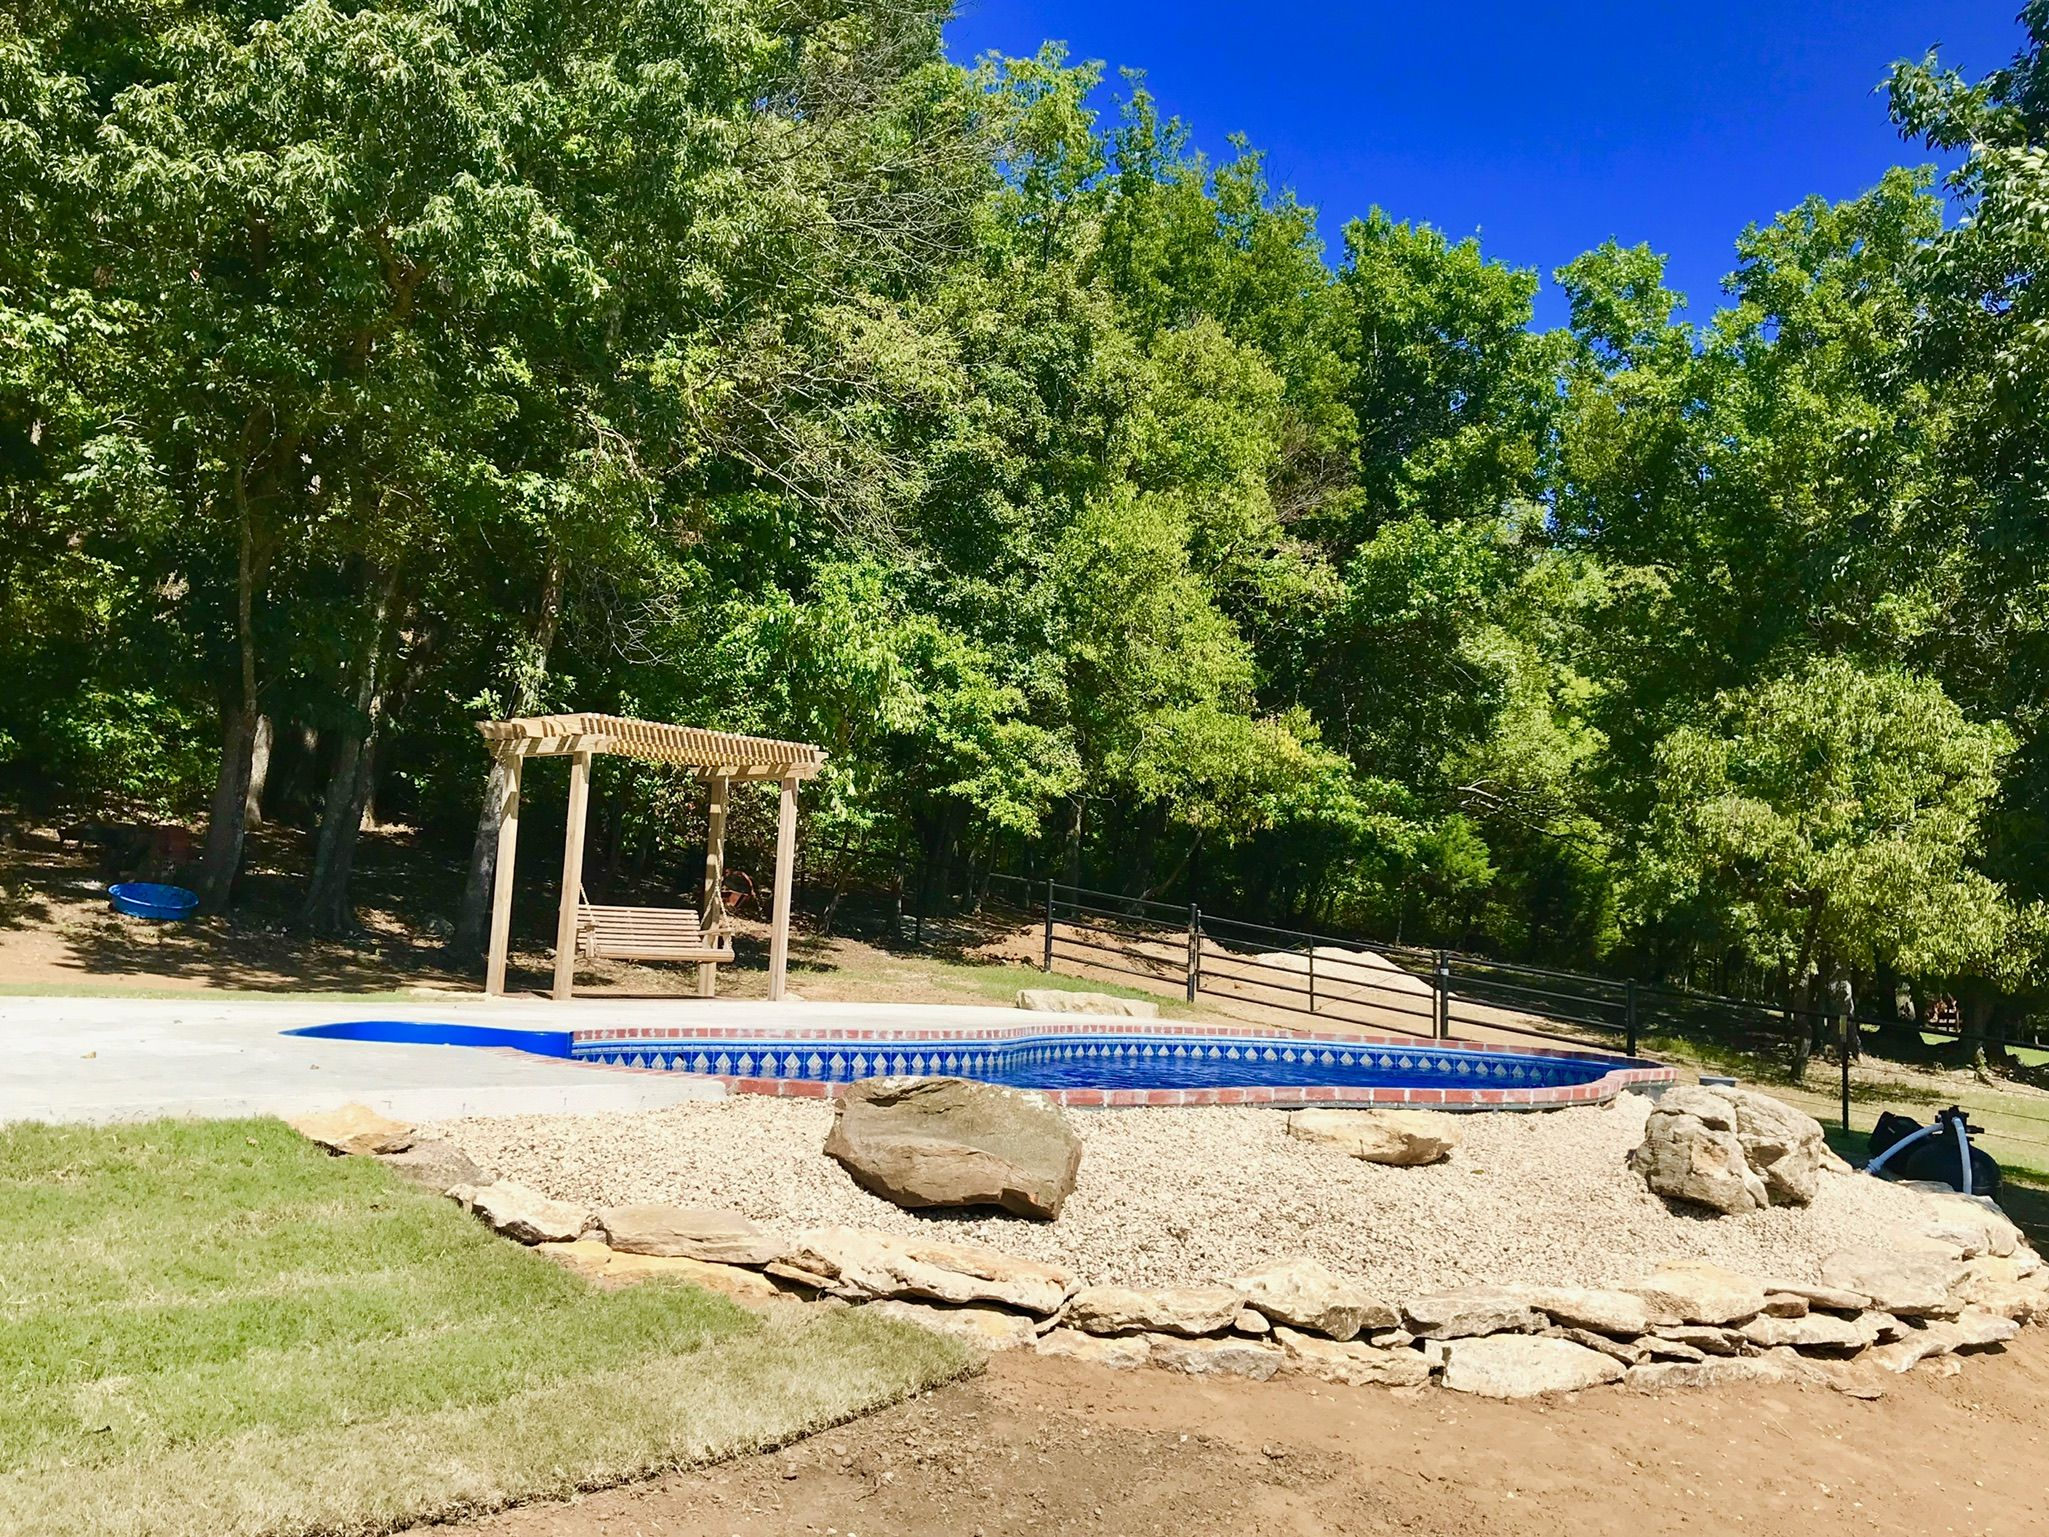 Freeform Semi In Ground Pool Inspiration Galaxy Home Recreation L Okc Tulsa Broken Arrow In 2020 In Ground Pools Galaxy Homes Outdoor Recreation